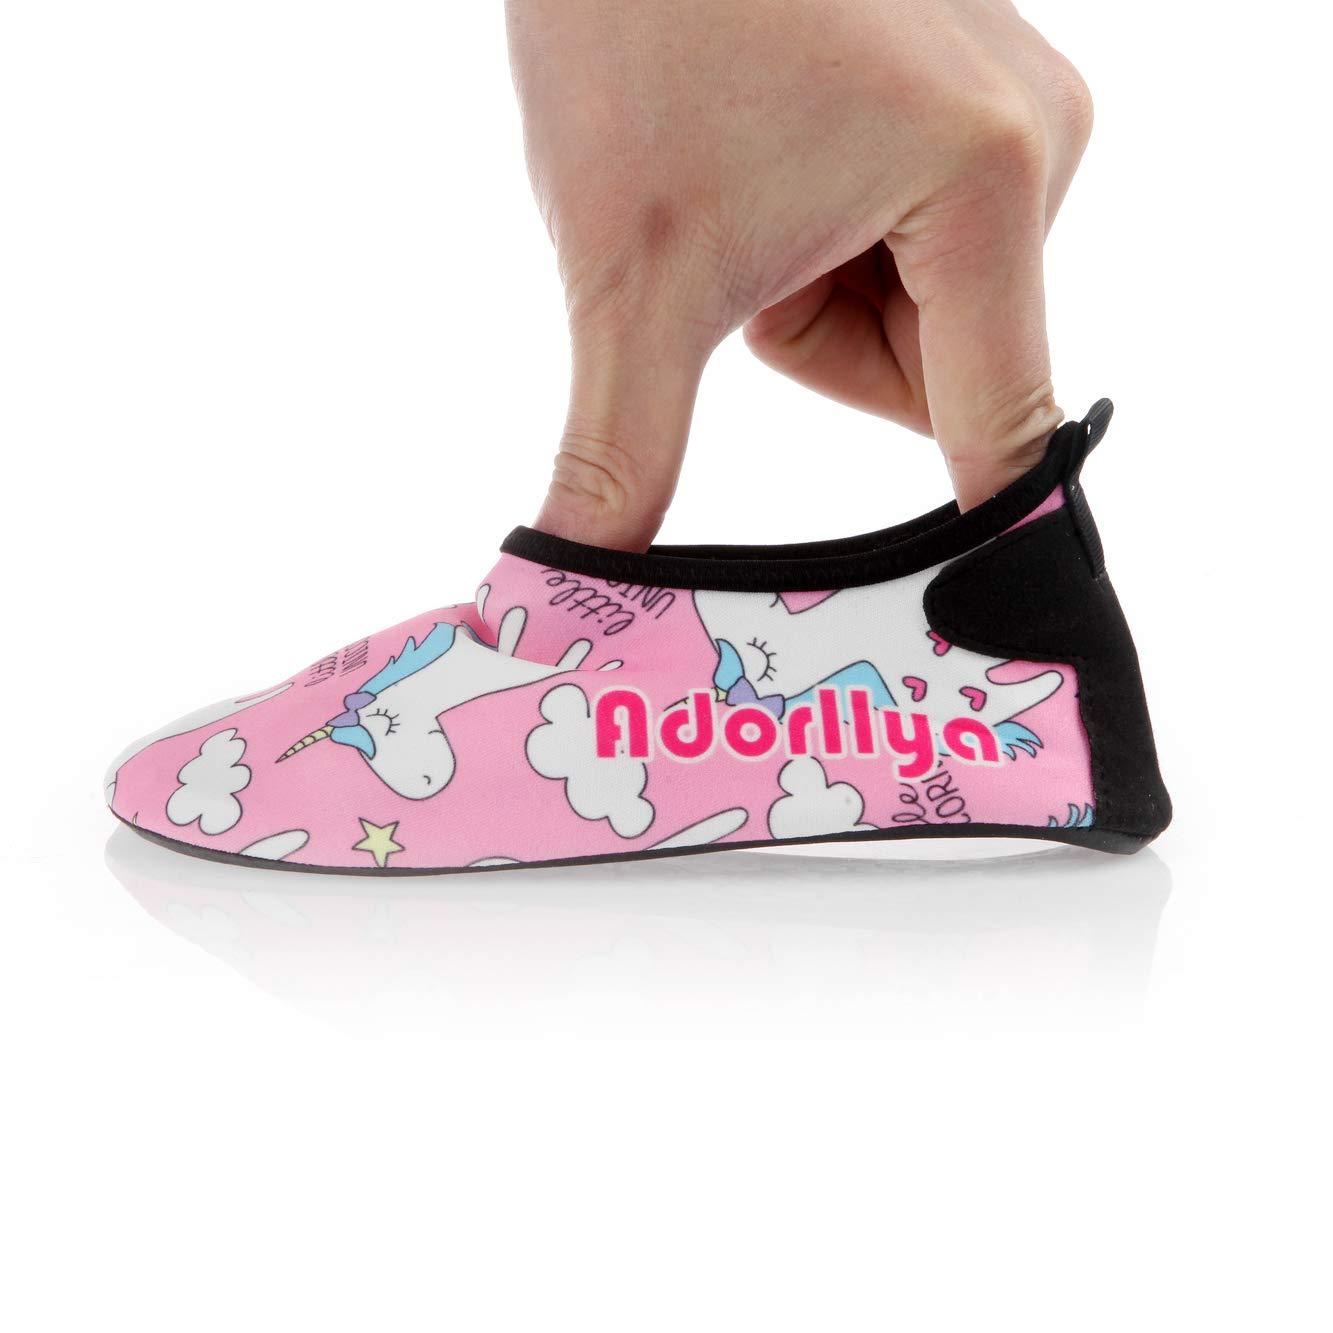 Adorllya Water Shoes Aqua Socks Water Socks Swim Shoes for Kids Toddlers Boys Girls